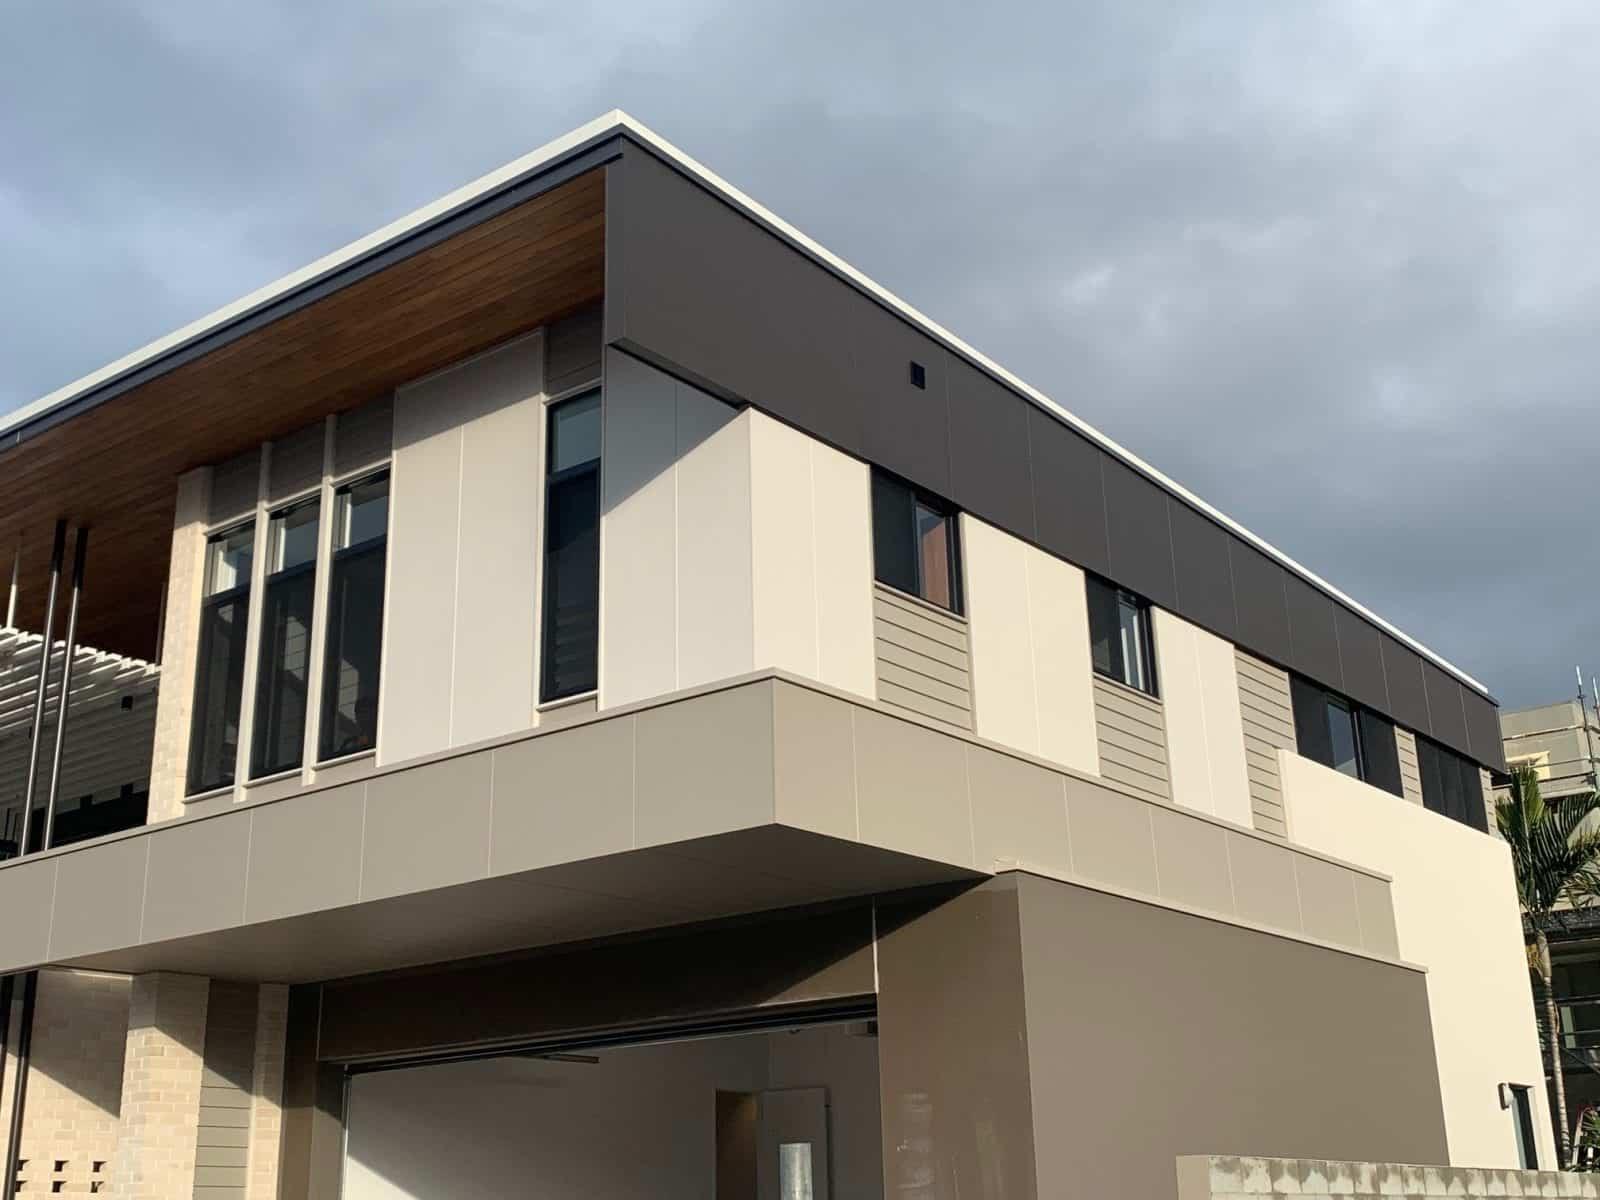 screen window project house-4